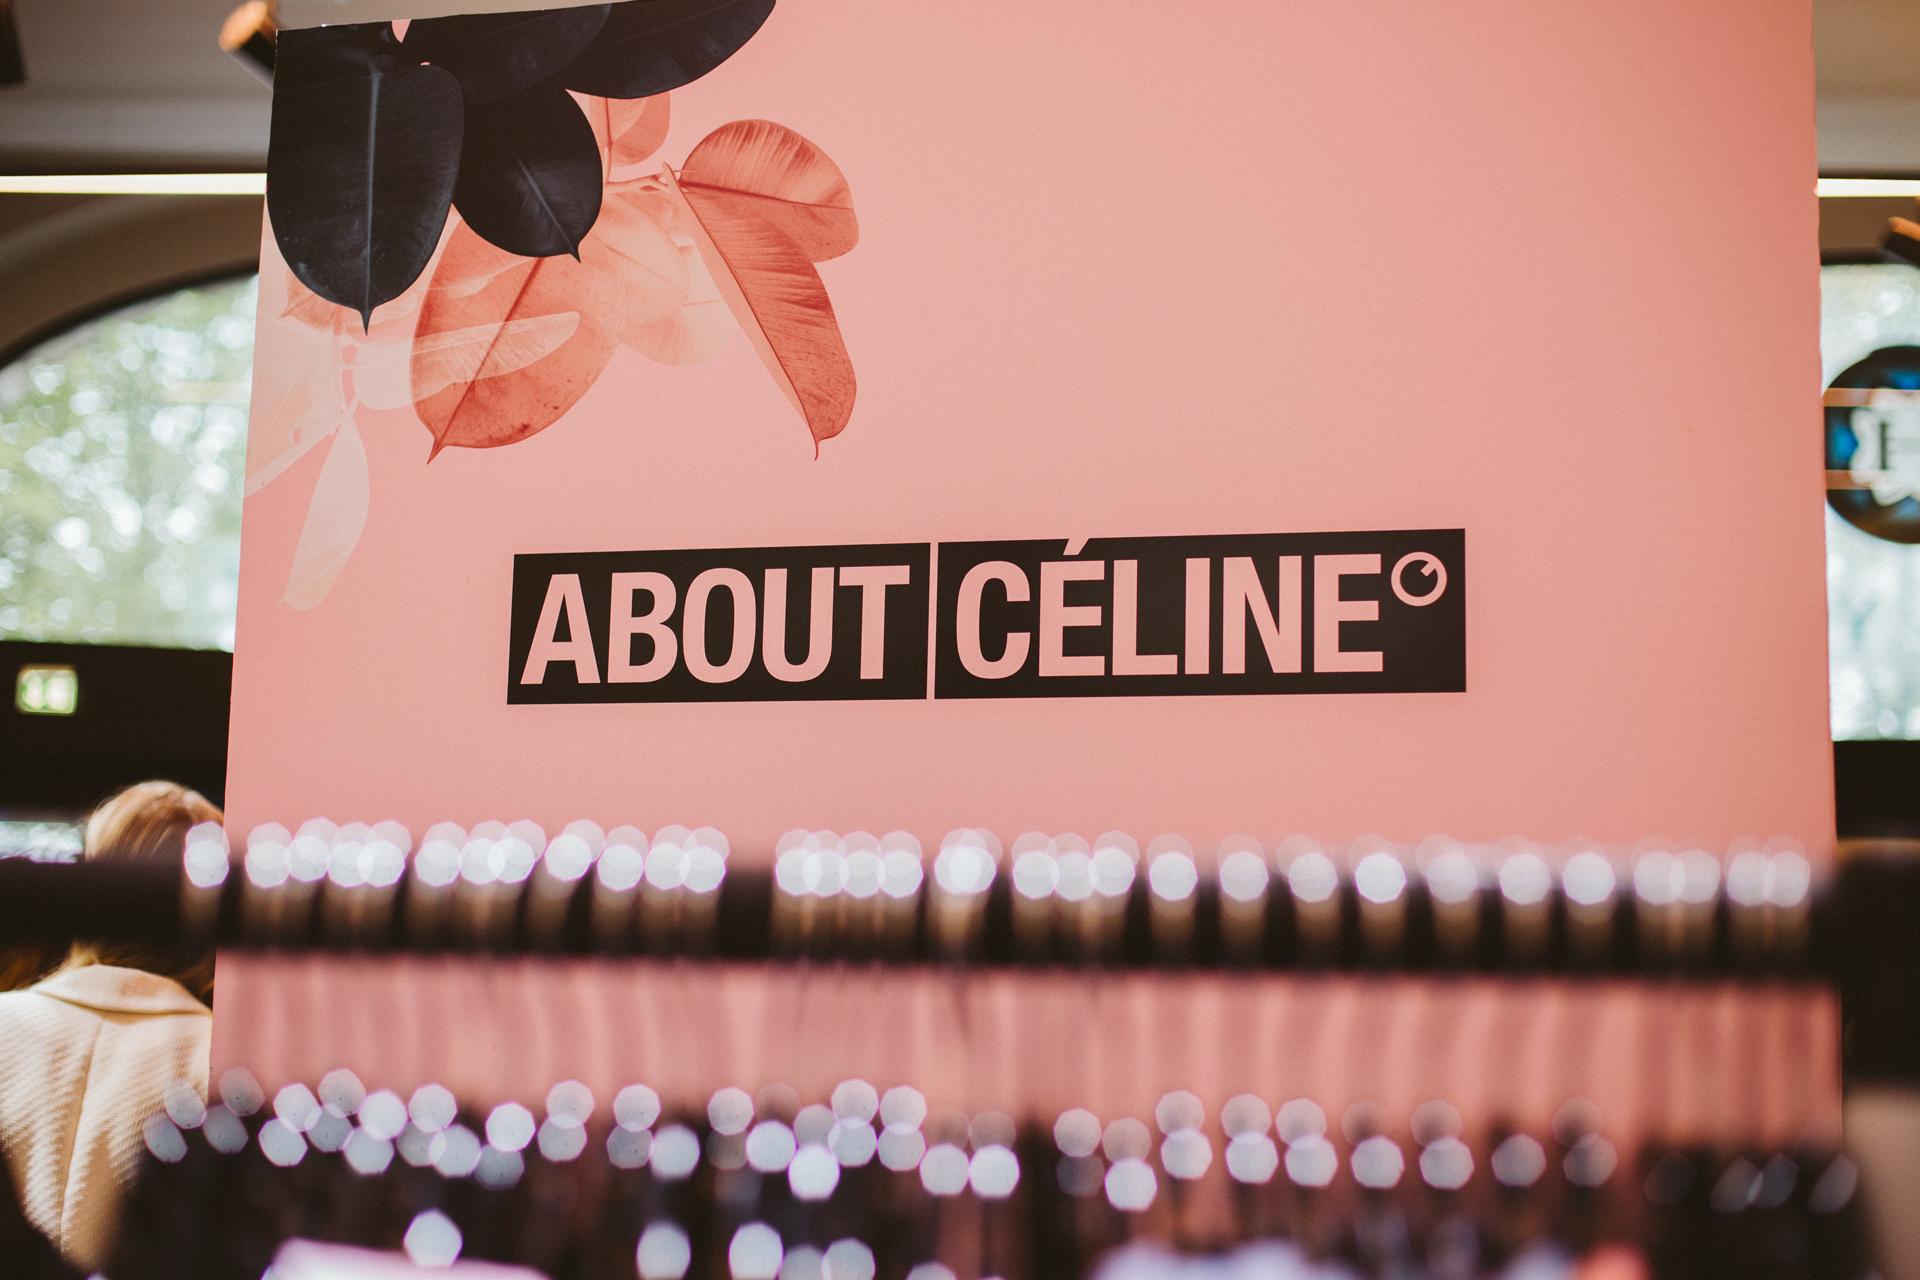 About Celine